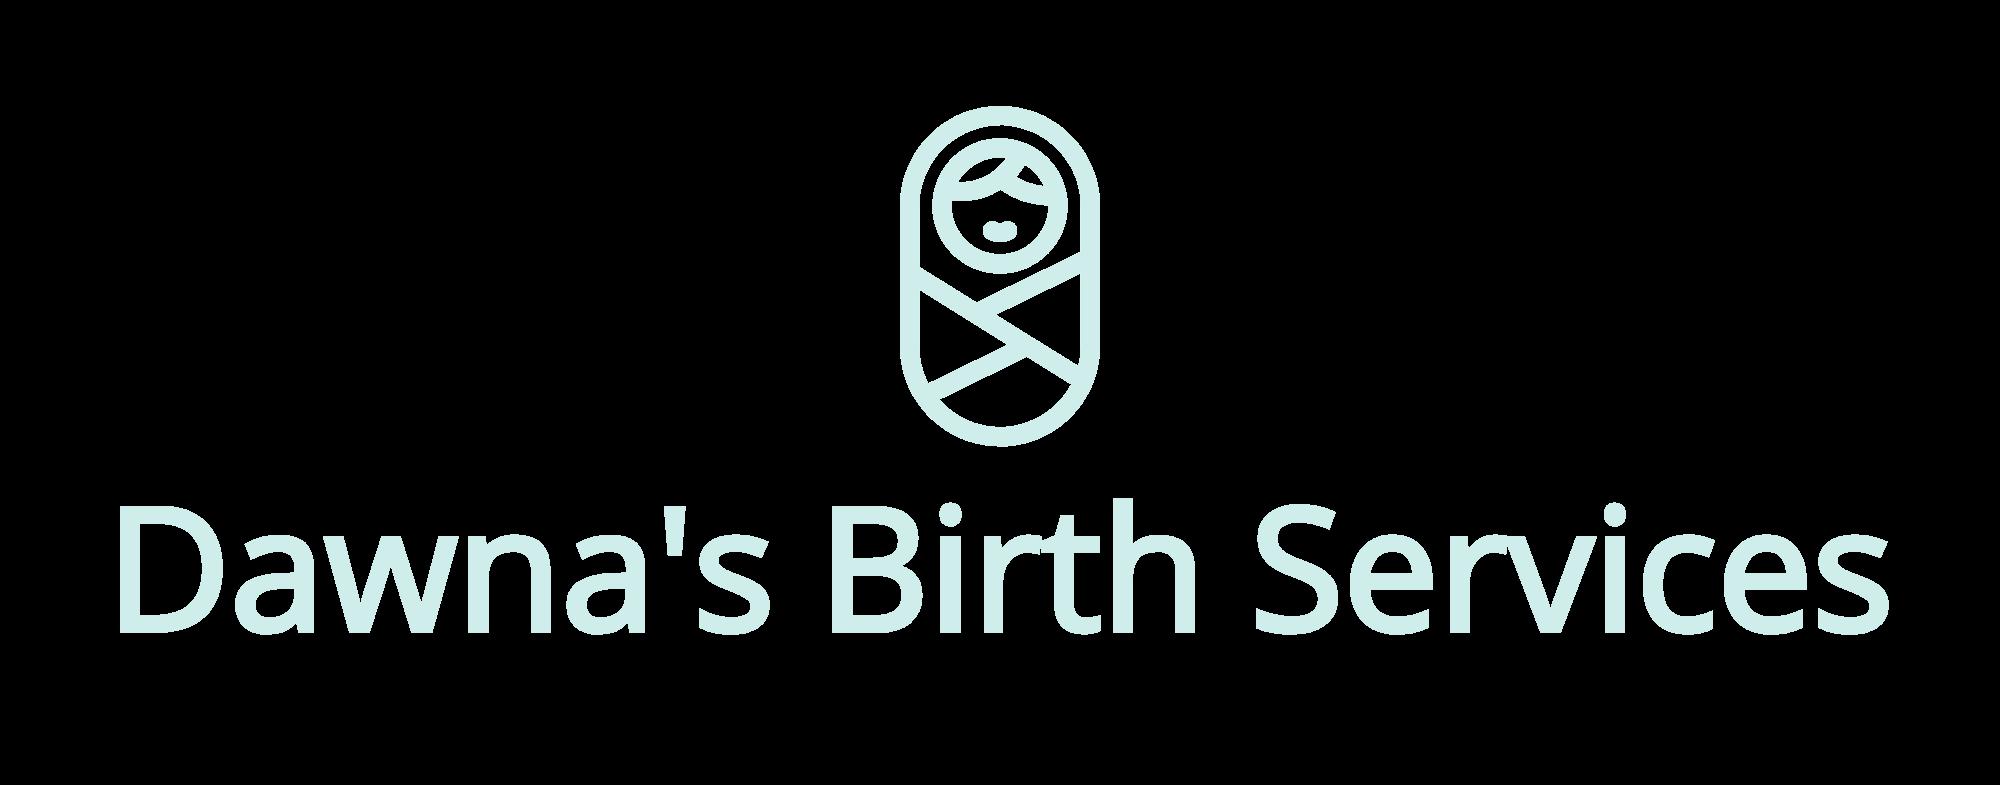 Dawna_s Birth Services-logo-green.png